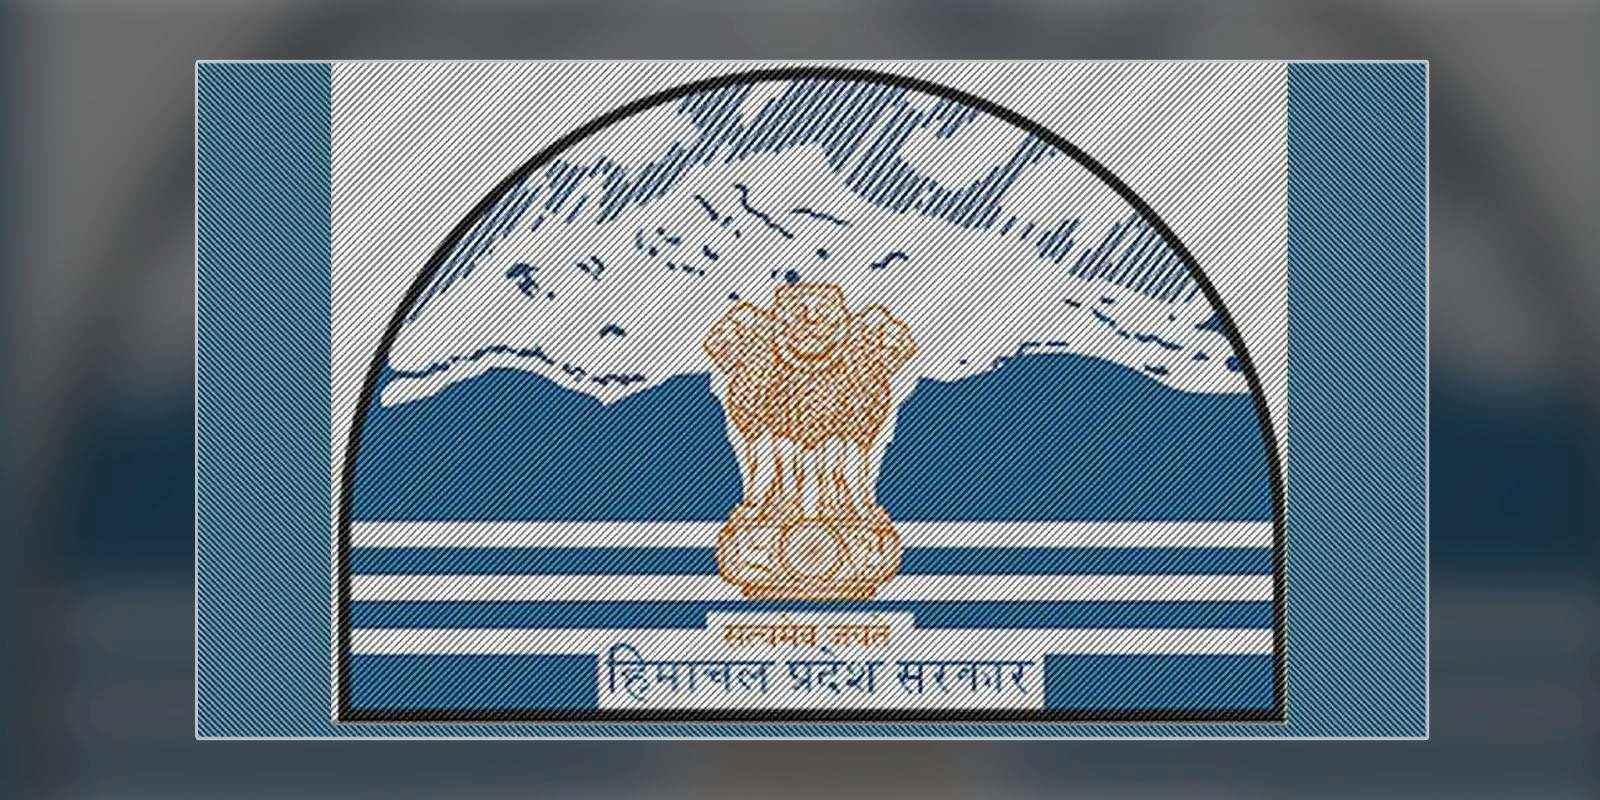 himachal pradesh oxygen supply to delhi